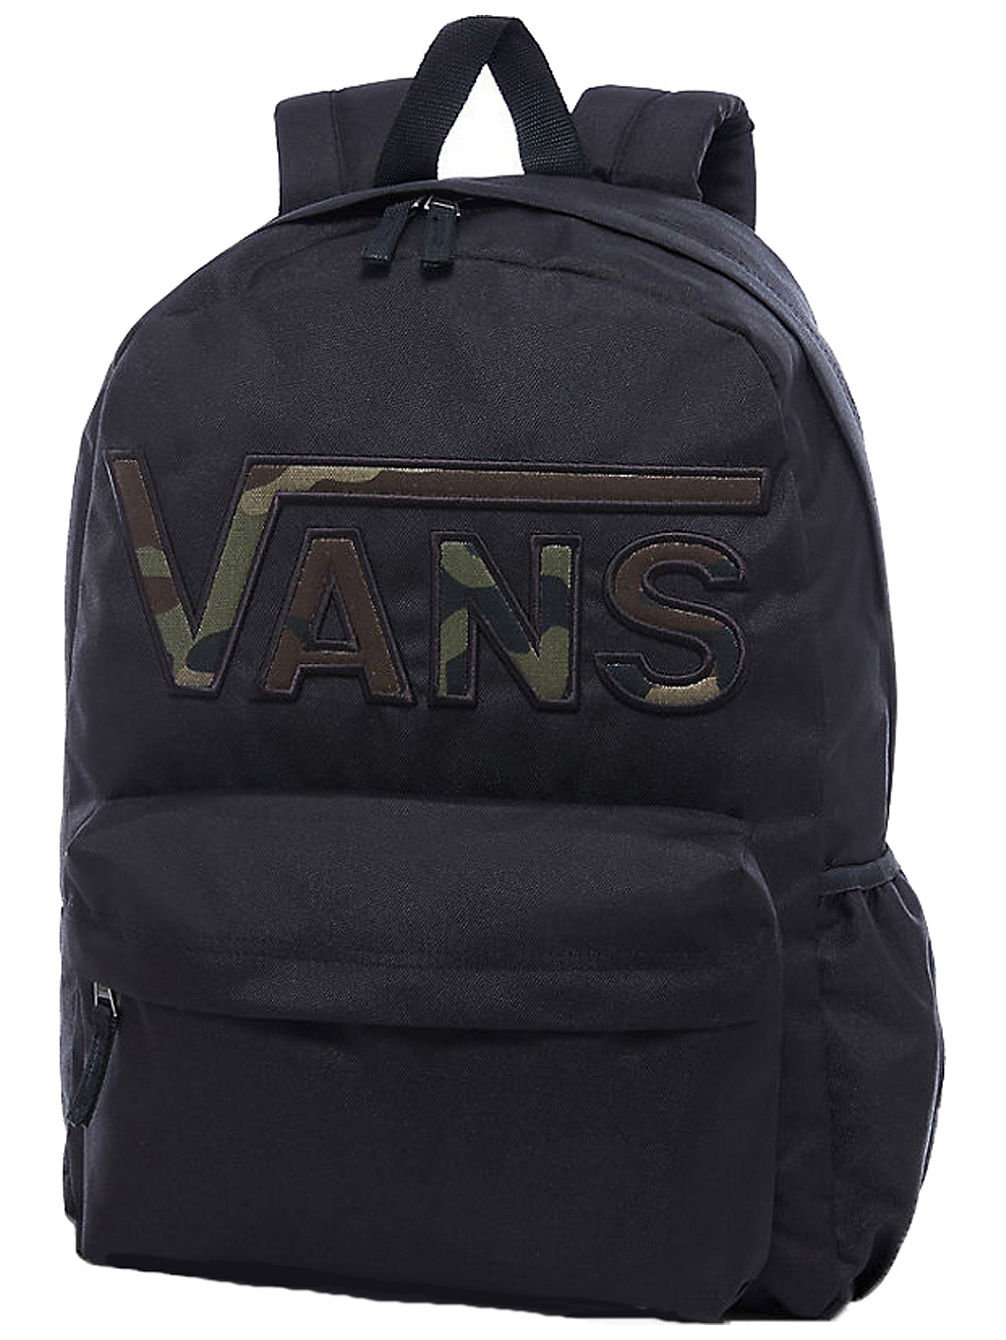 609b0d51b2c9 Buy Vans Realm Flying V Backpack online at Blue Tomato